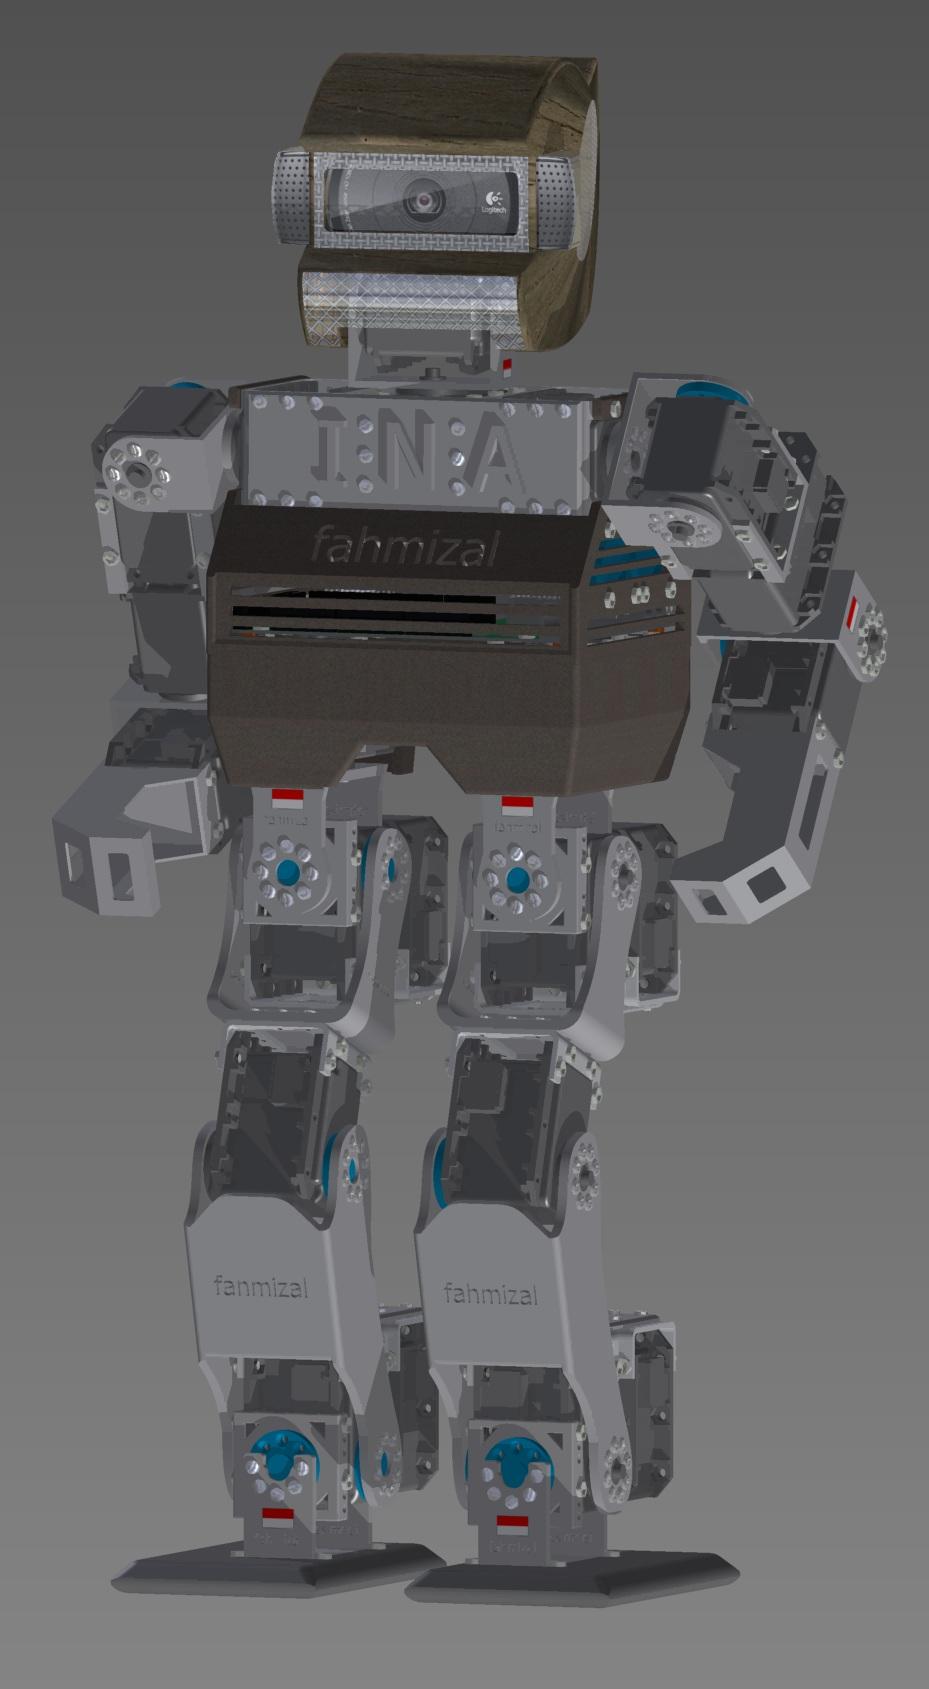 Kid Size Robot Fahmizal 5